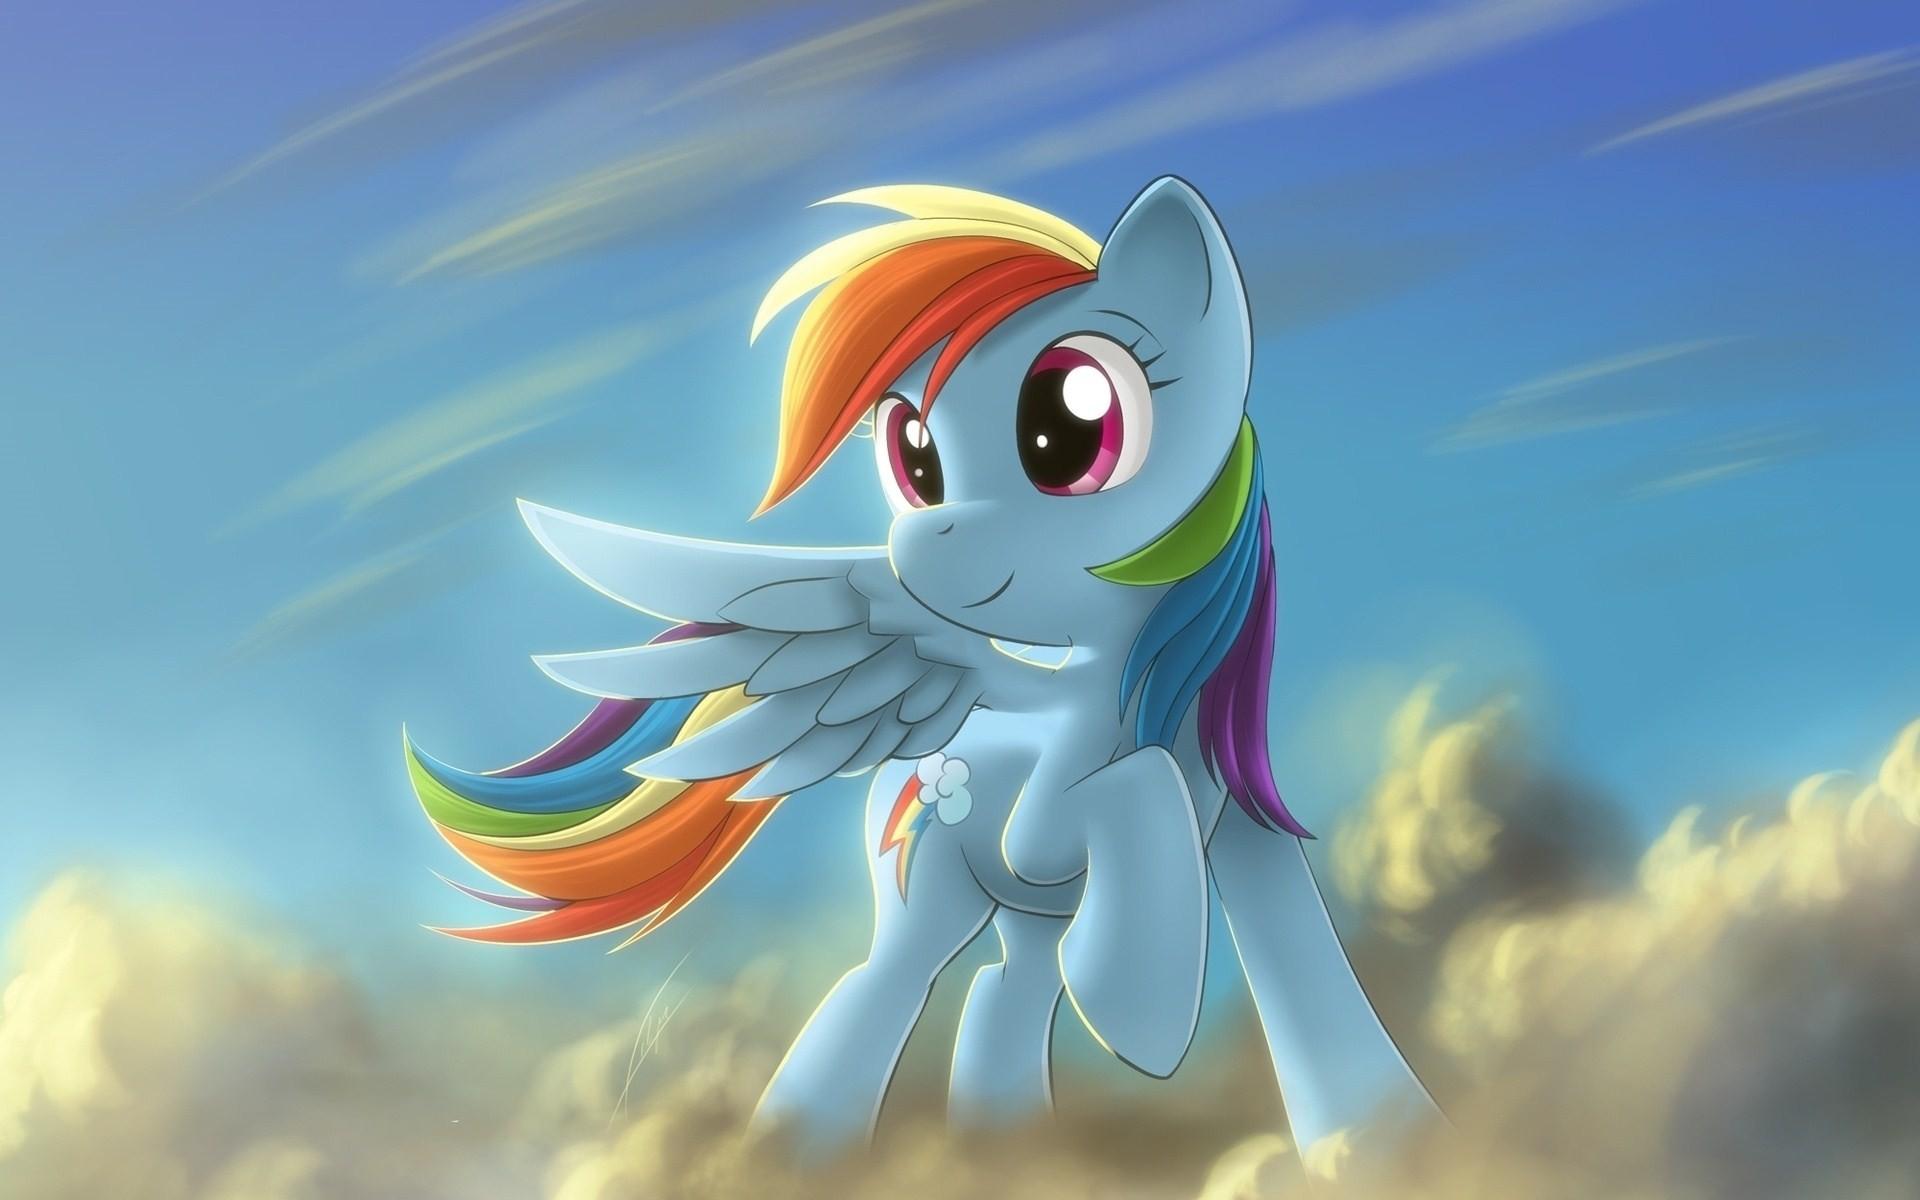 My-little-pony-animated-cartoon-wallpaper-1920×1200.jpg